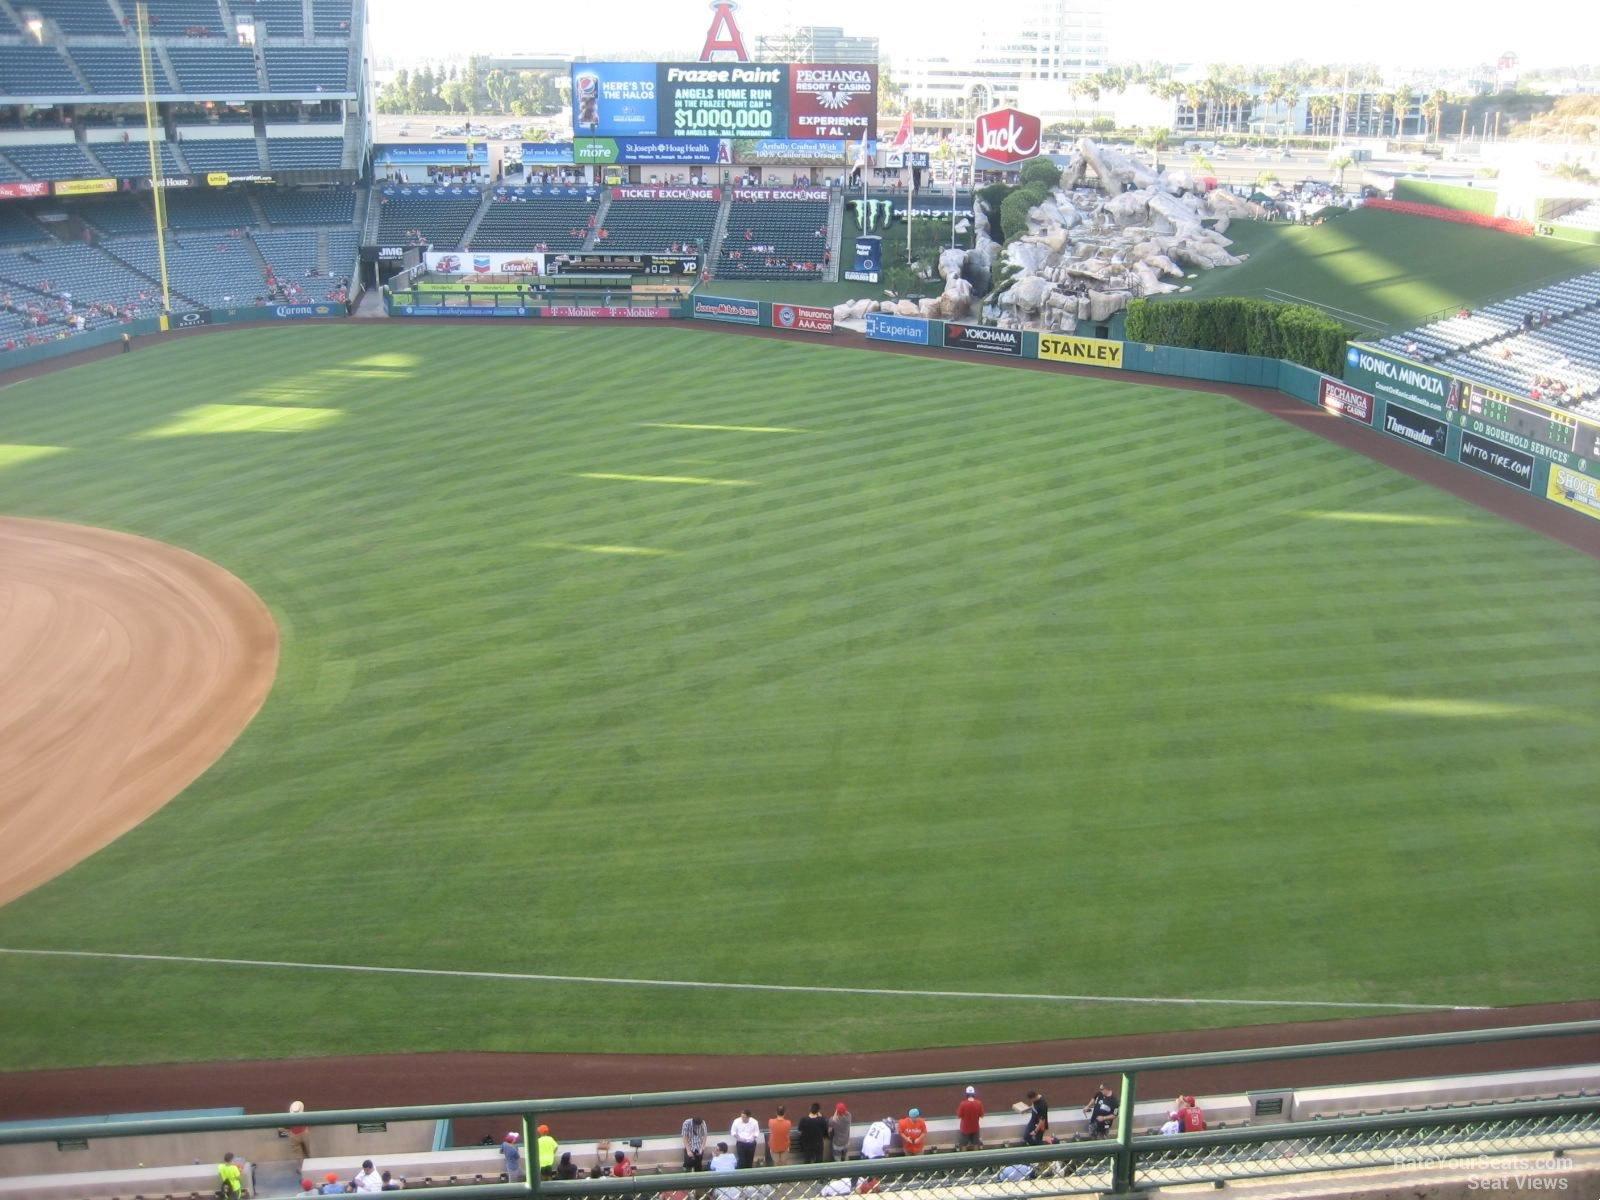 Angel Stadium Section 428 - RateYourSeats.com